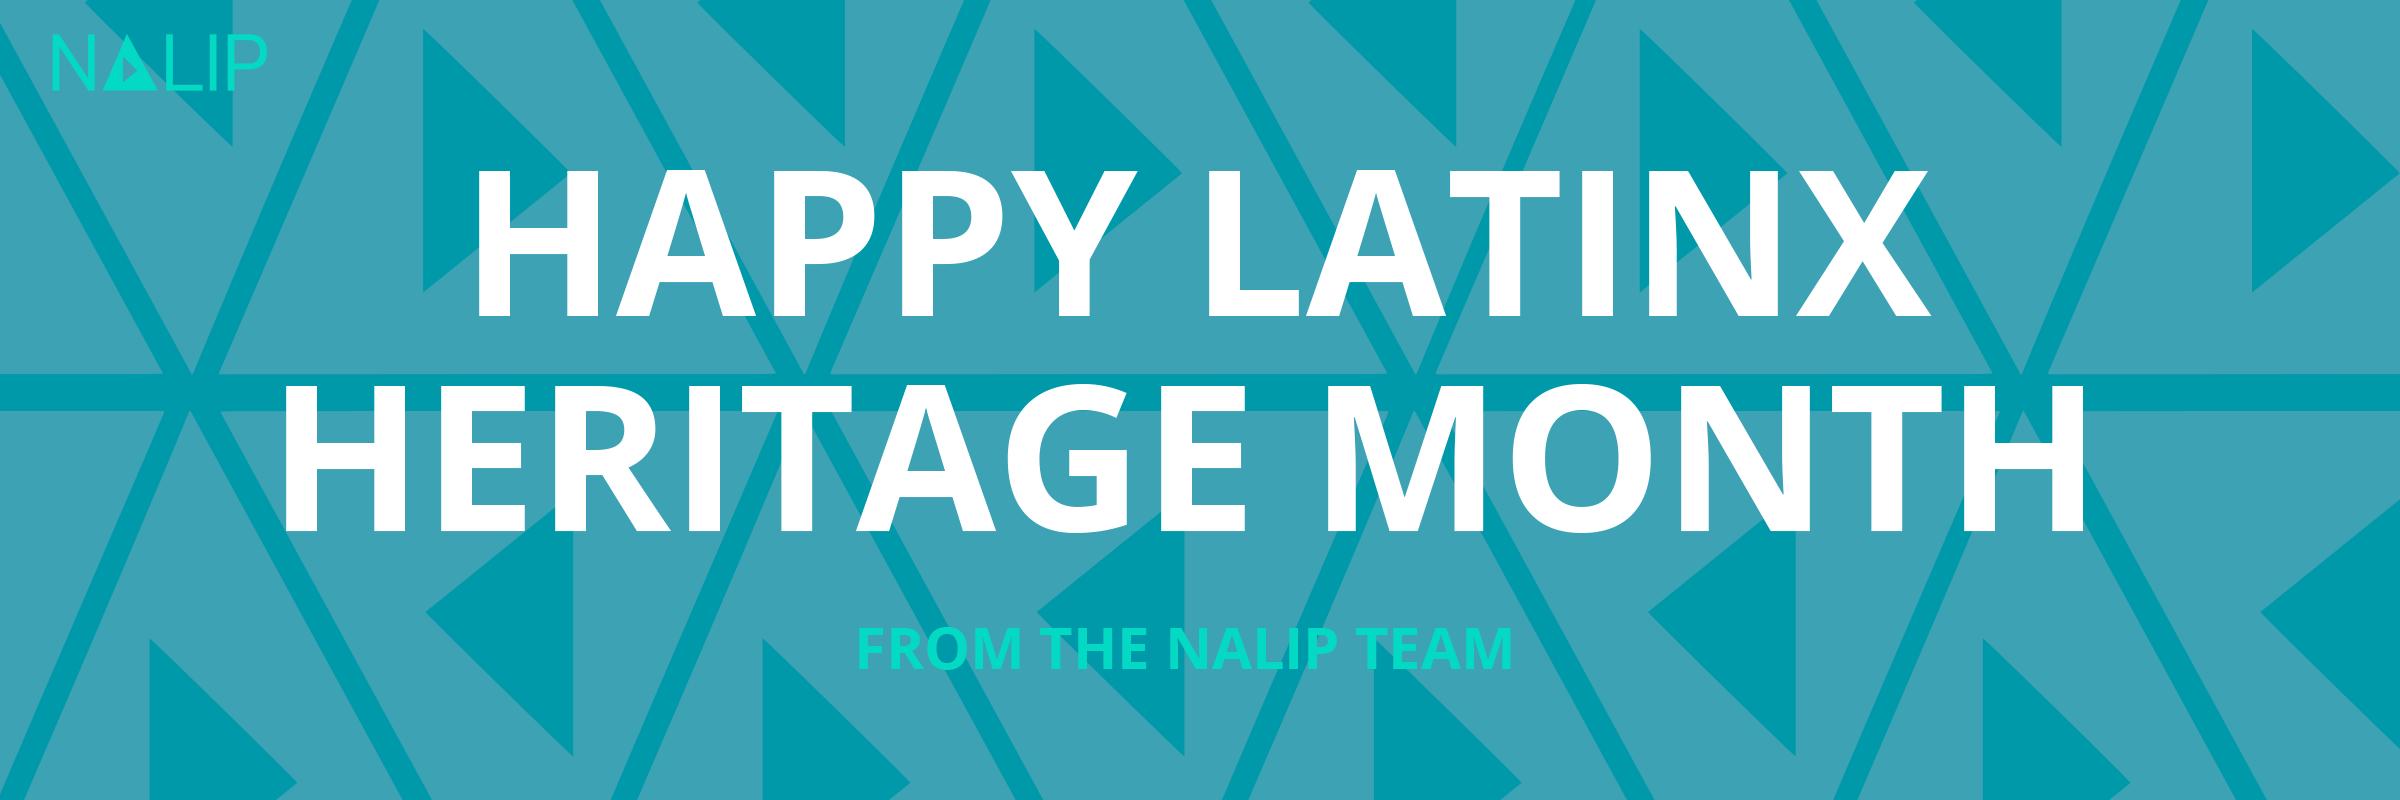 NALIP's Picks for Latinx Heritage Month 2021